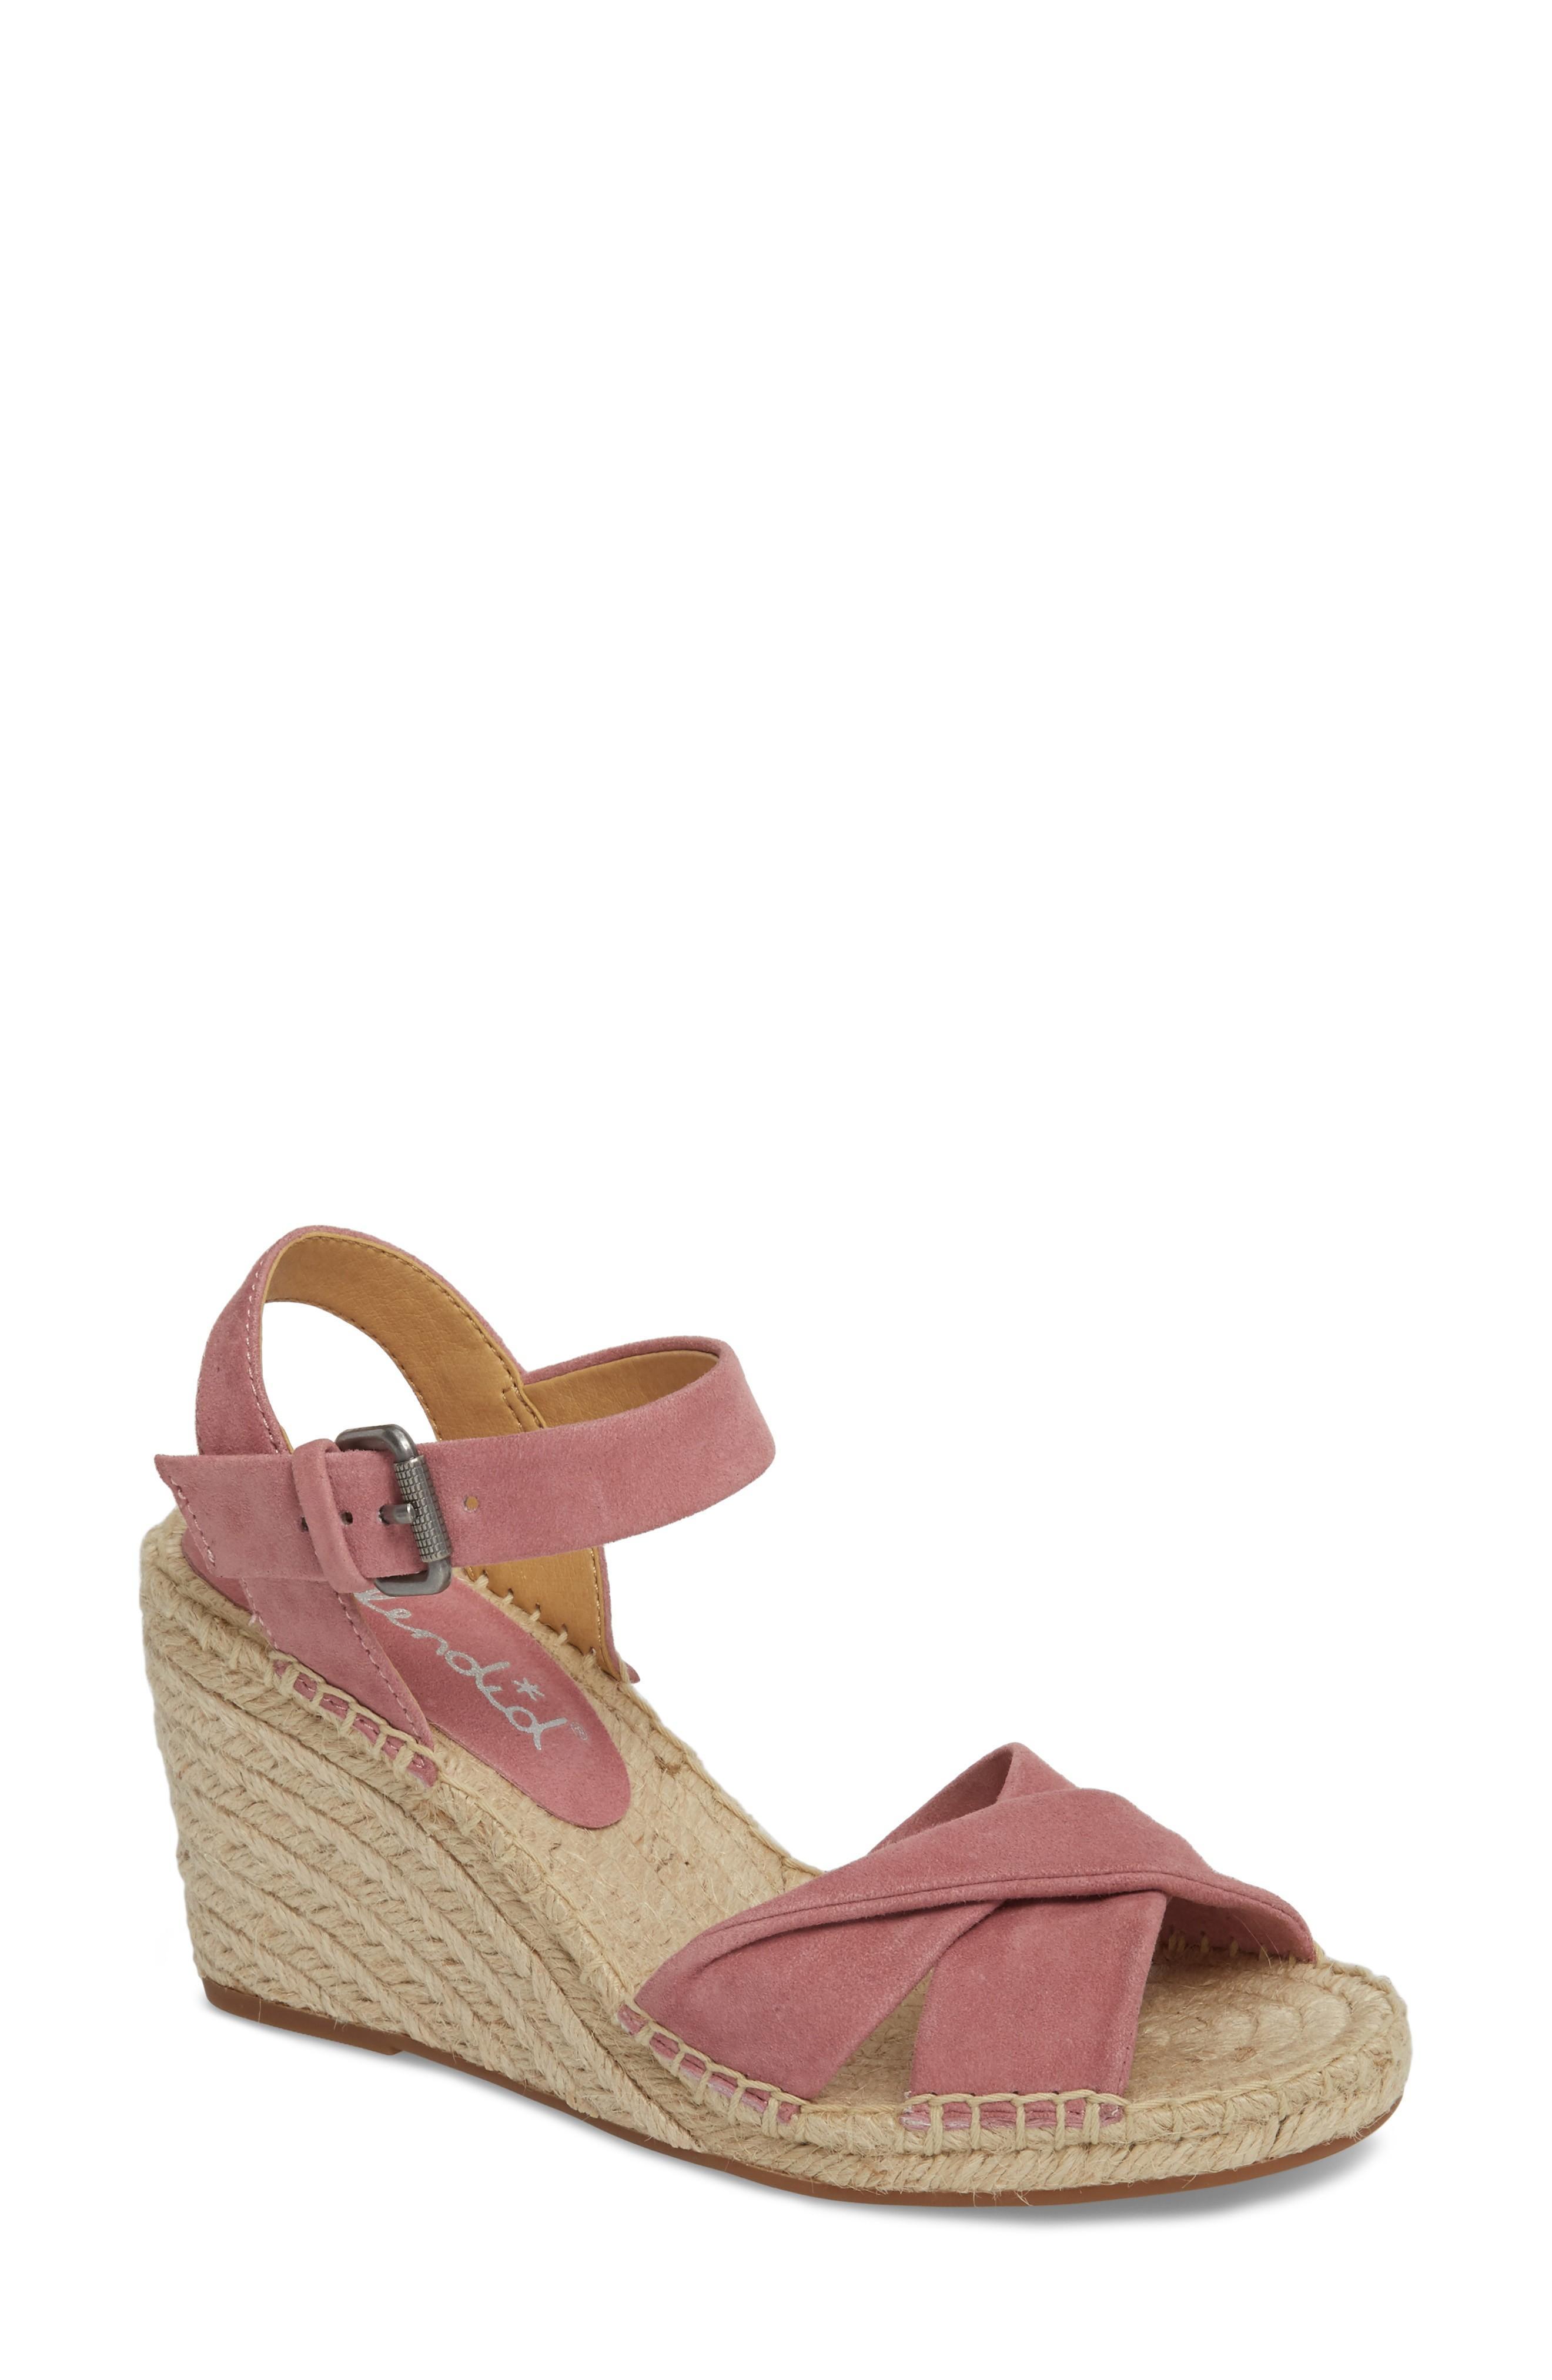 Splendid Fairfax Espadrille Wedge Sandal In Mesa Rose Suede